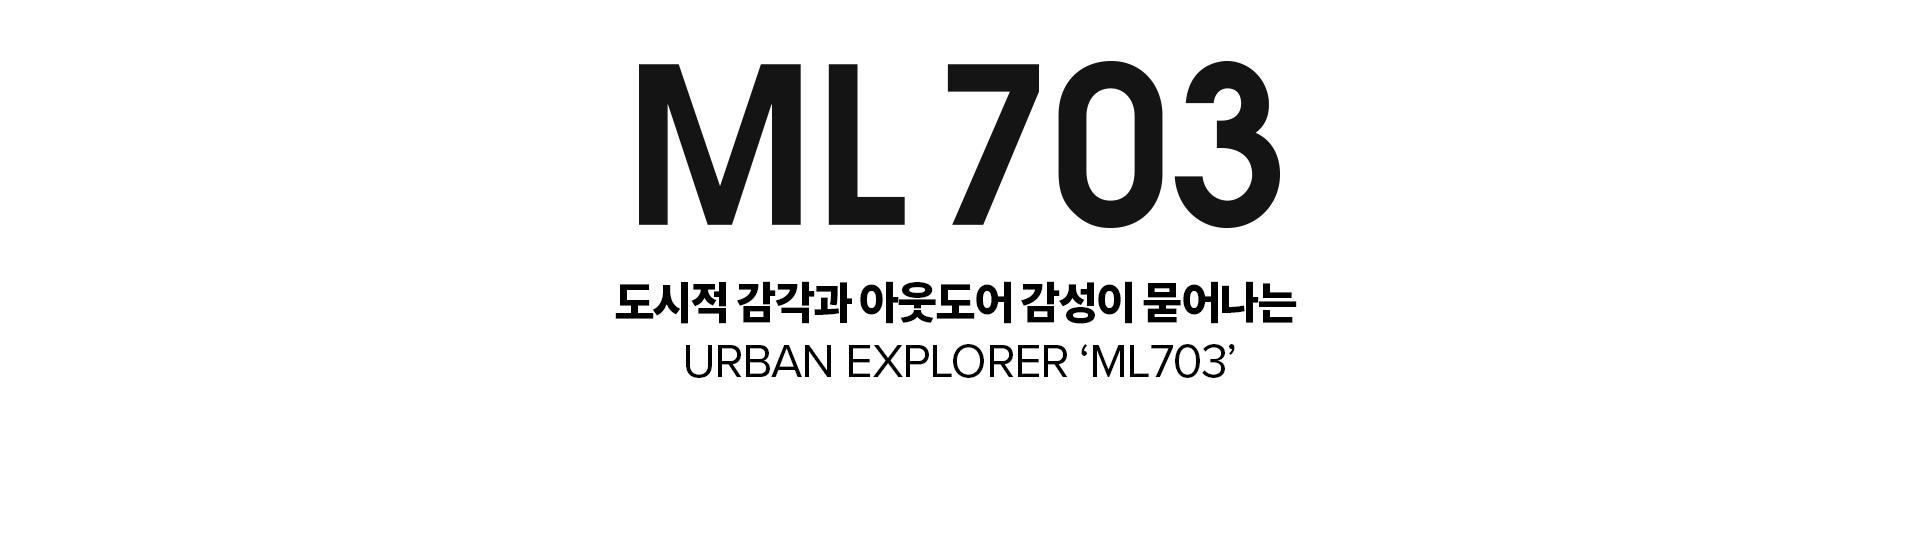 lm703